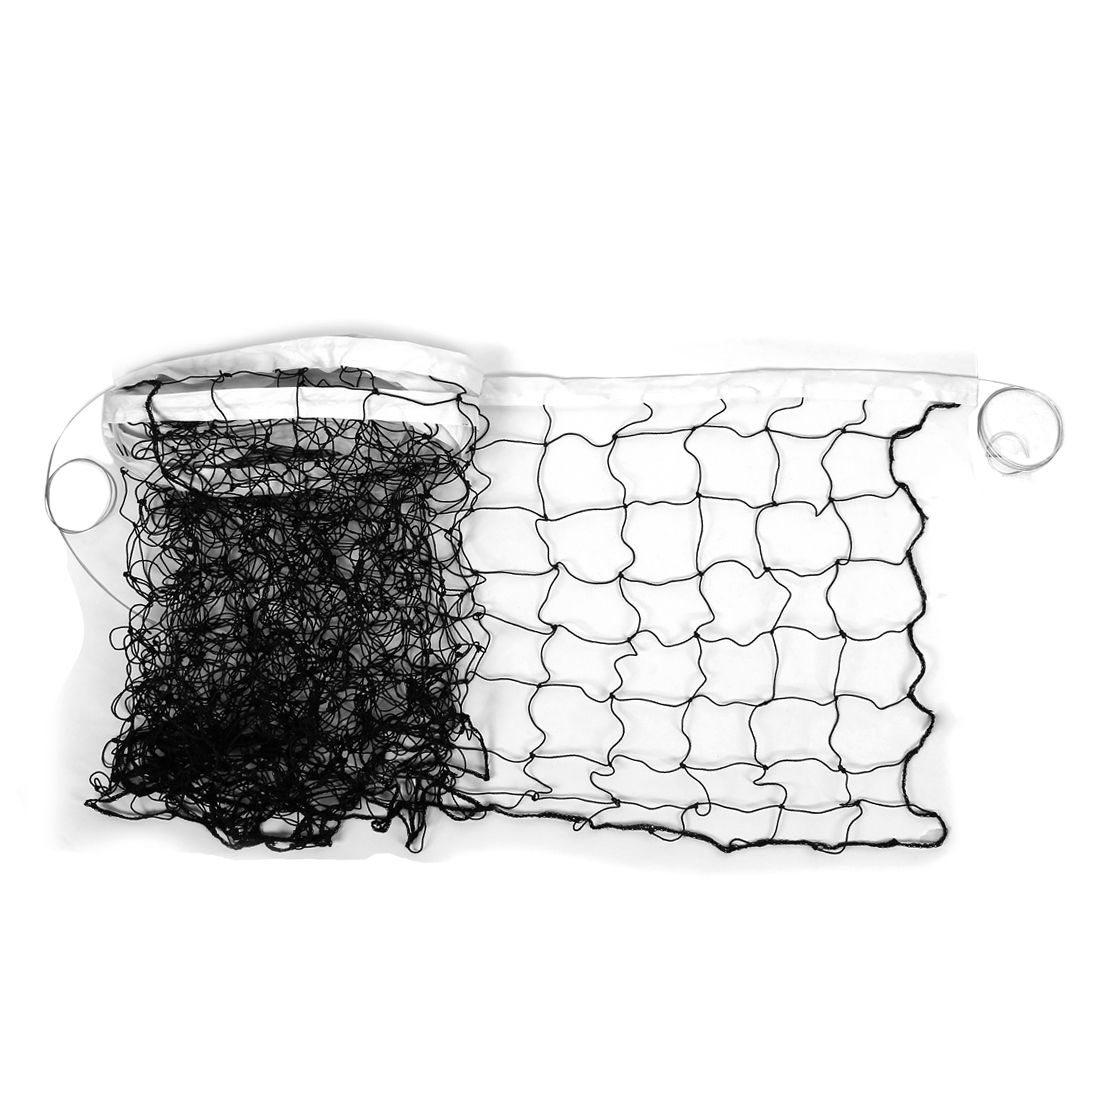 Nylon Retangular Outdoor Indoor Sport Volleyball Braided Knotted Net 10M x 1M